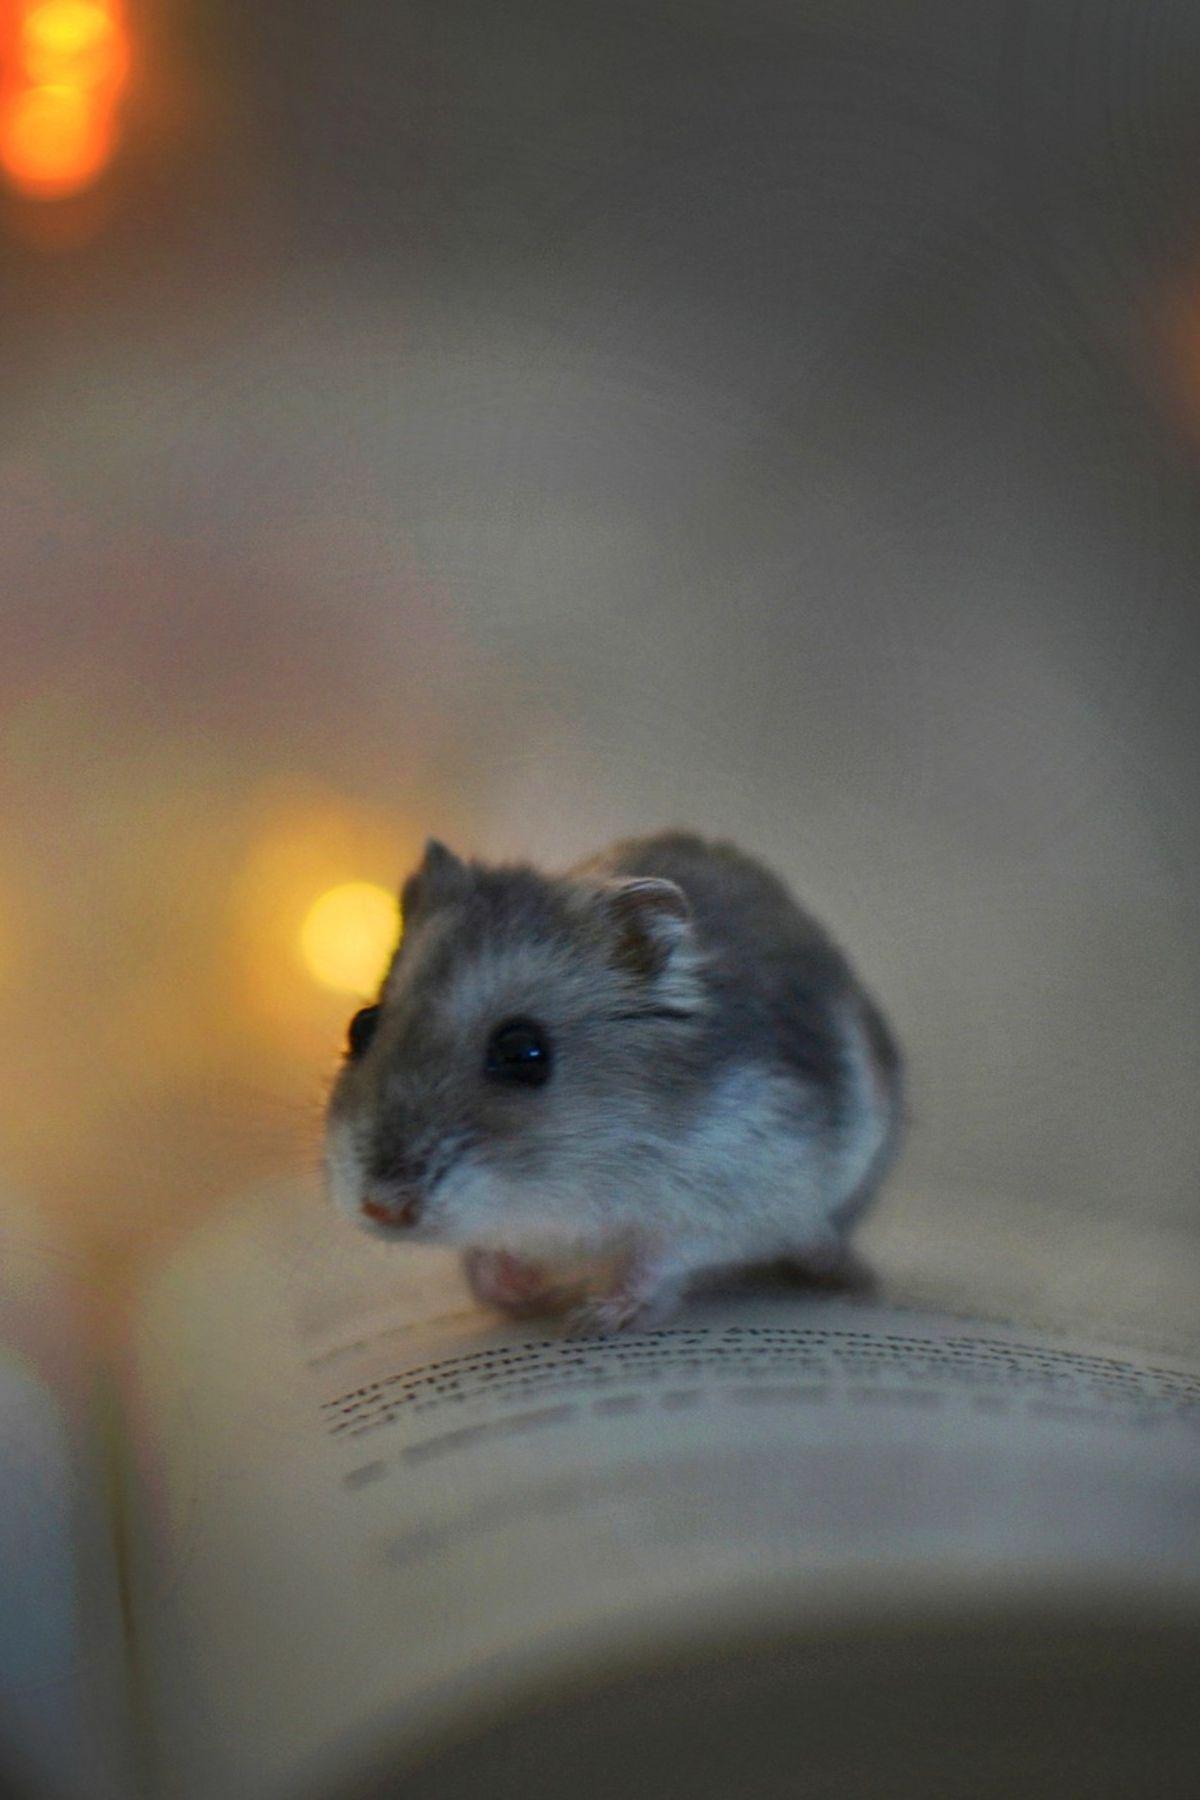 Habitrail Ovo Dwarf Hamster Habitat Spiffy Pet Products Dwarf Hamster Cute Small Animals Hamster Habitat